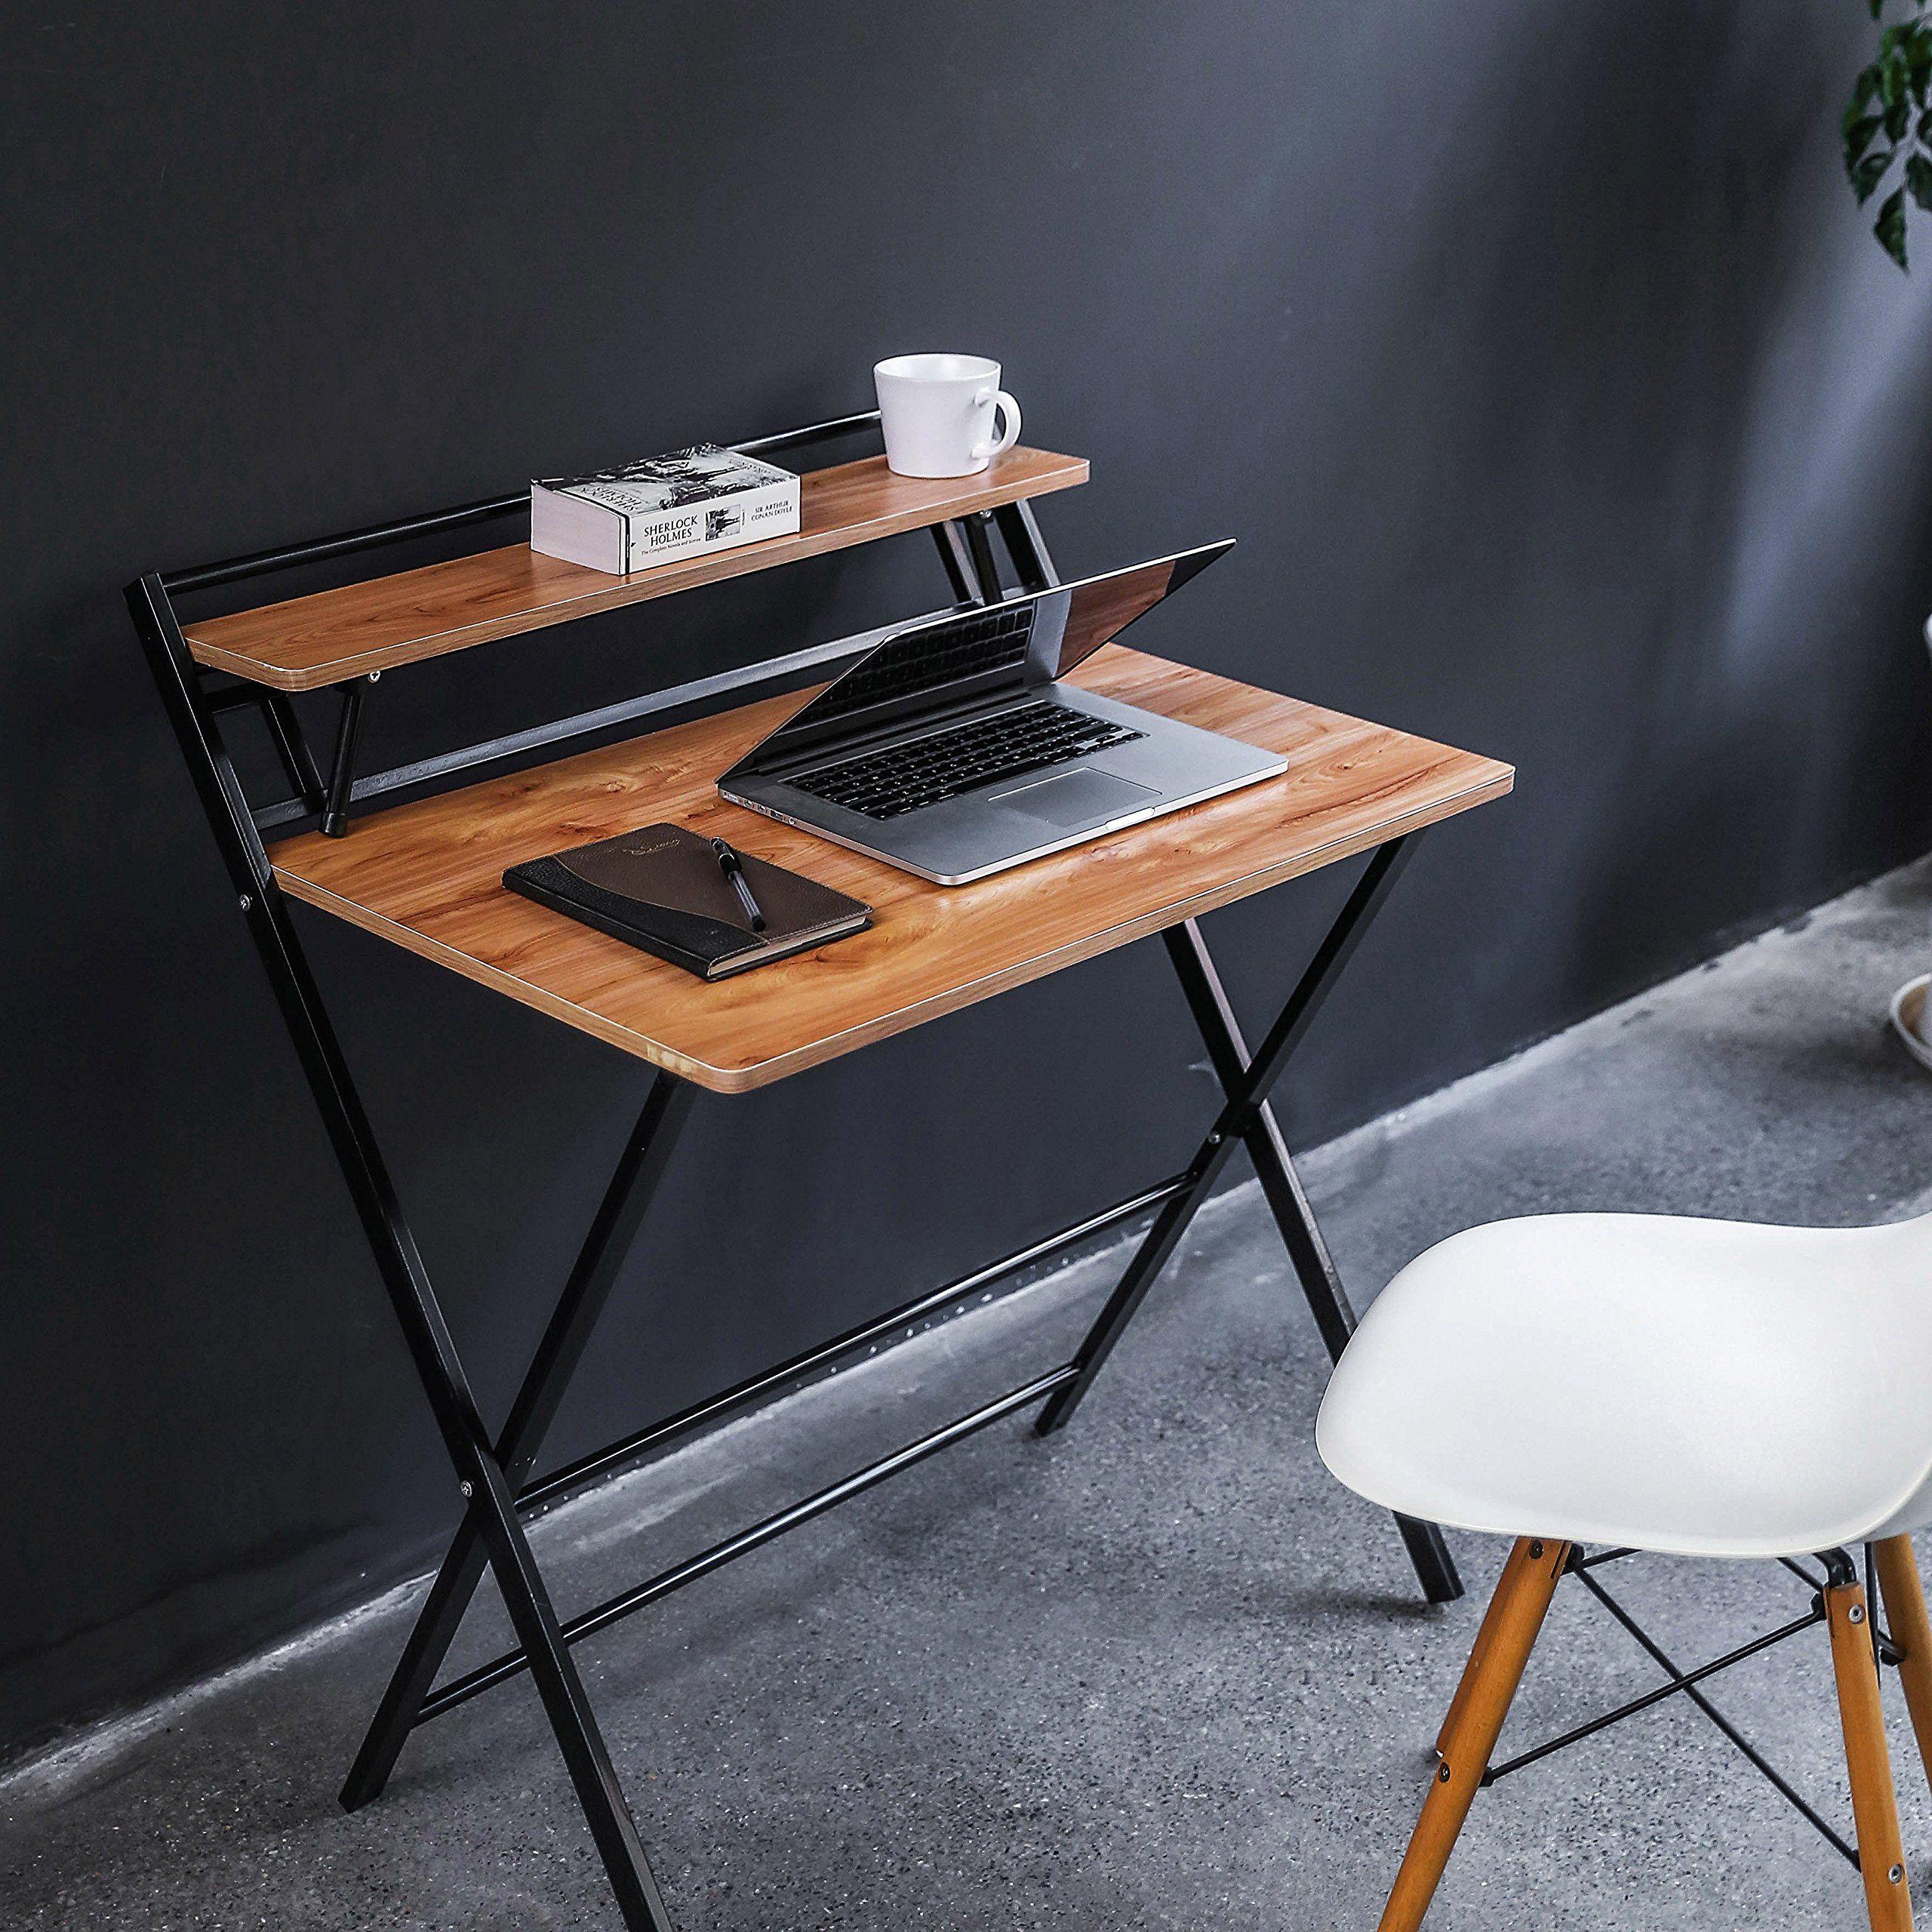 Jiwu 2 Style Folding Desk For Small Space Home Corner Desks